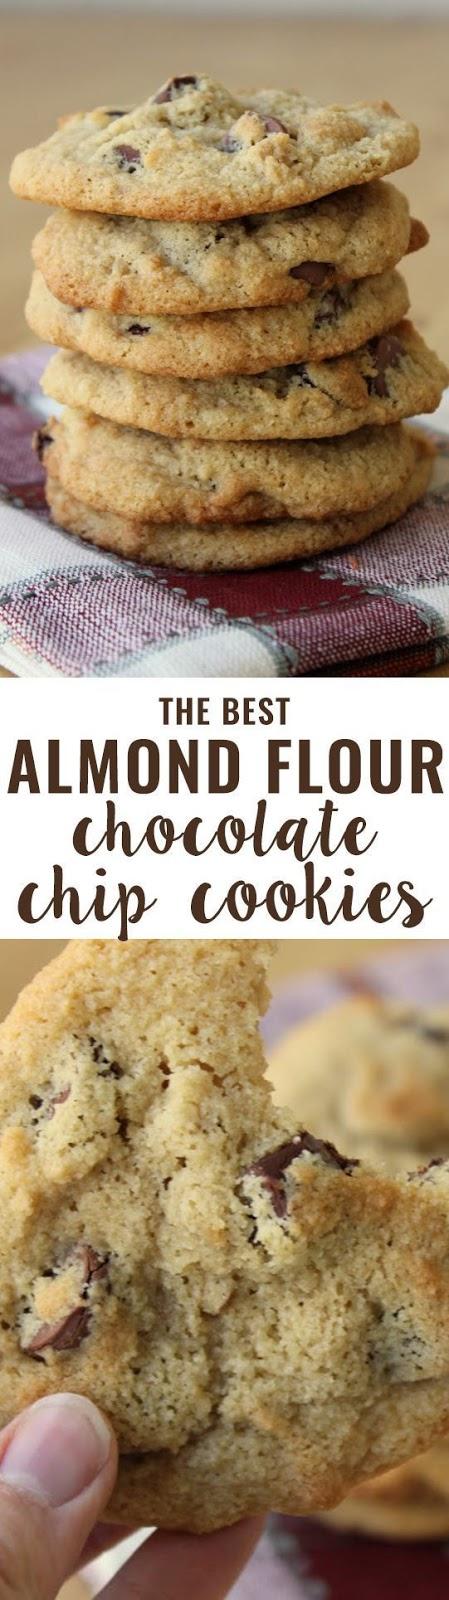 Almond Flour Chocolate Chip Cookies {Grain-Free}